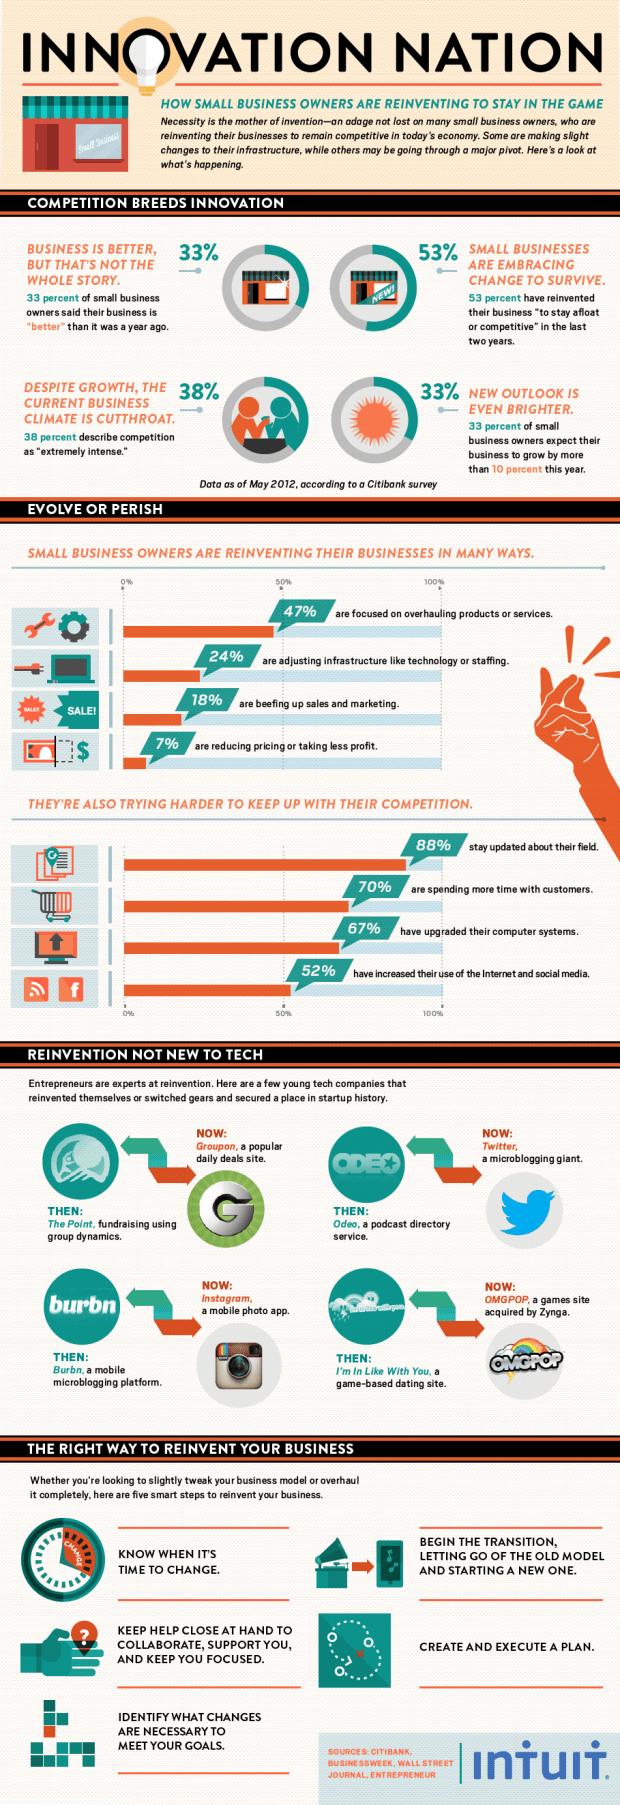 Intuit-Innovation-reinvention